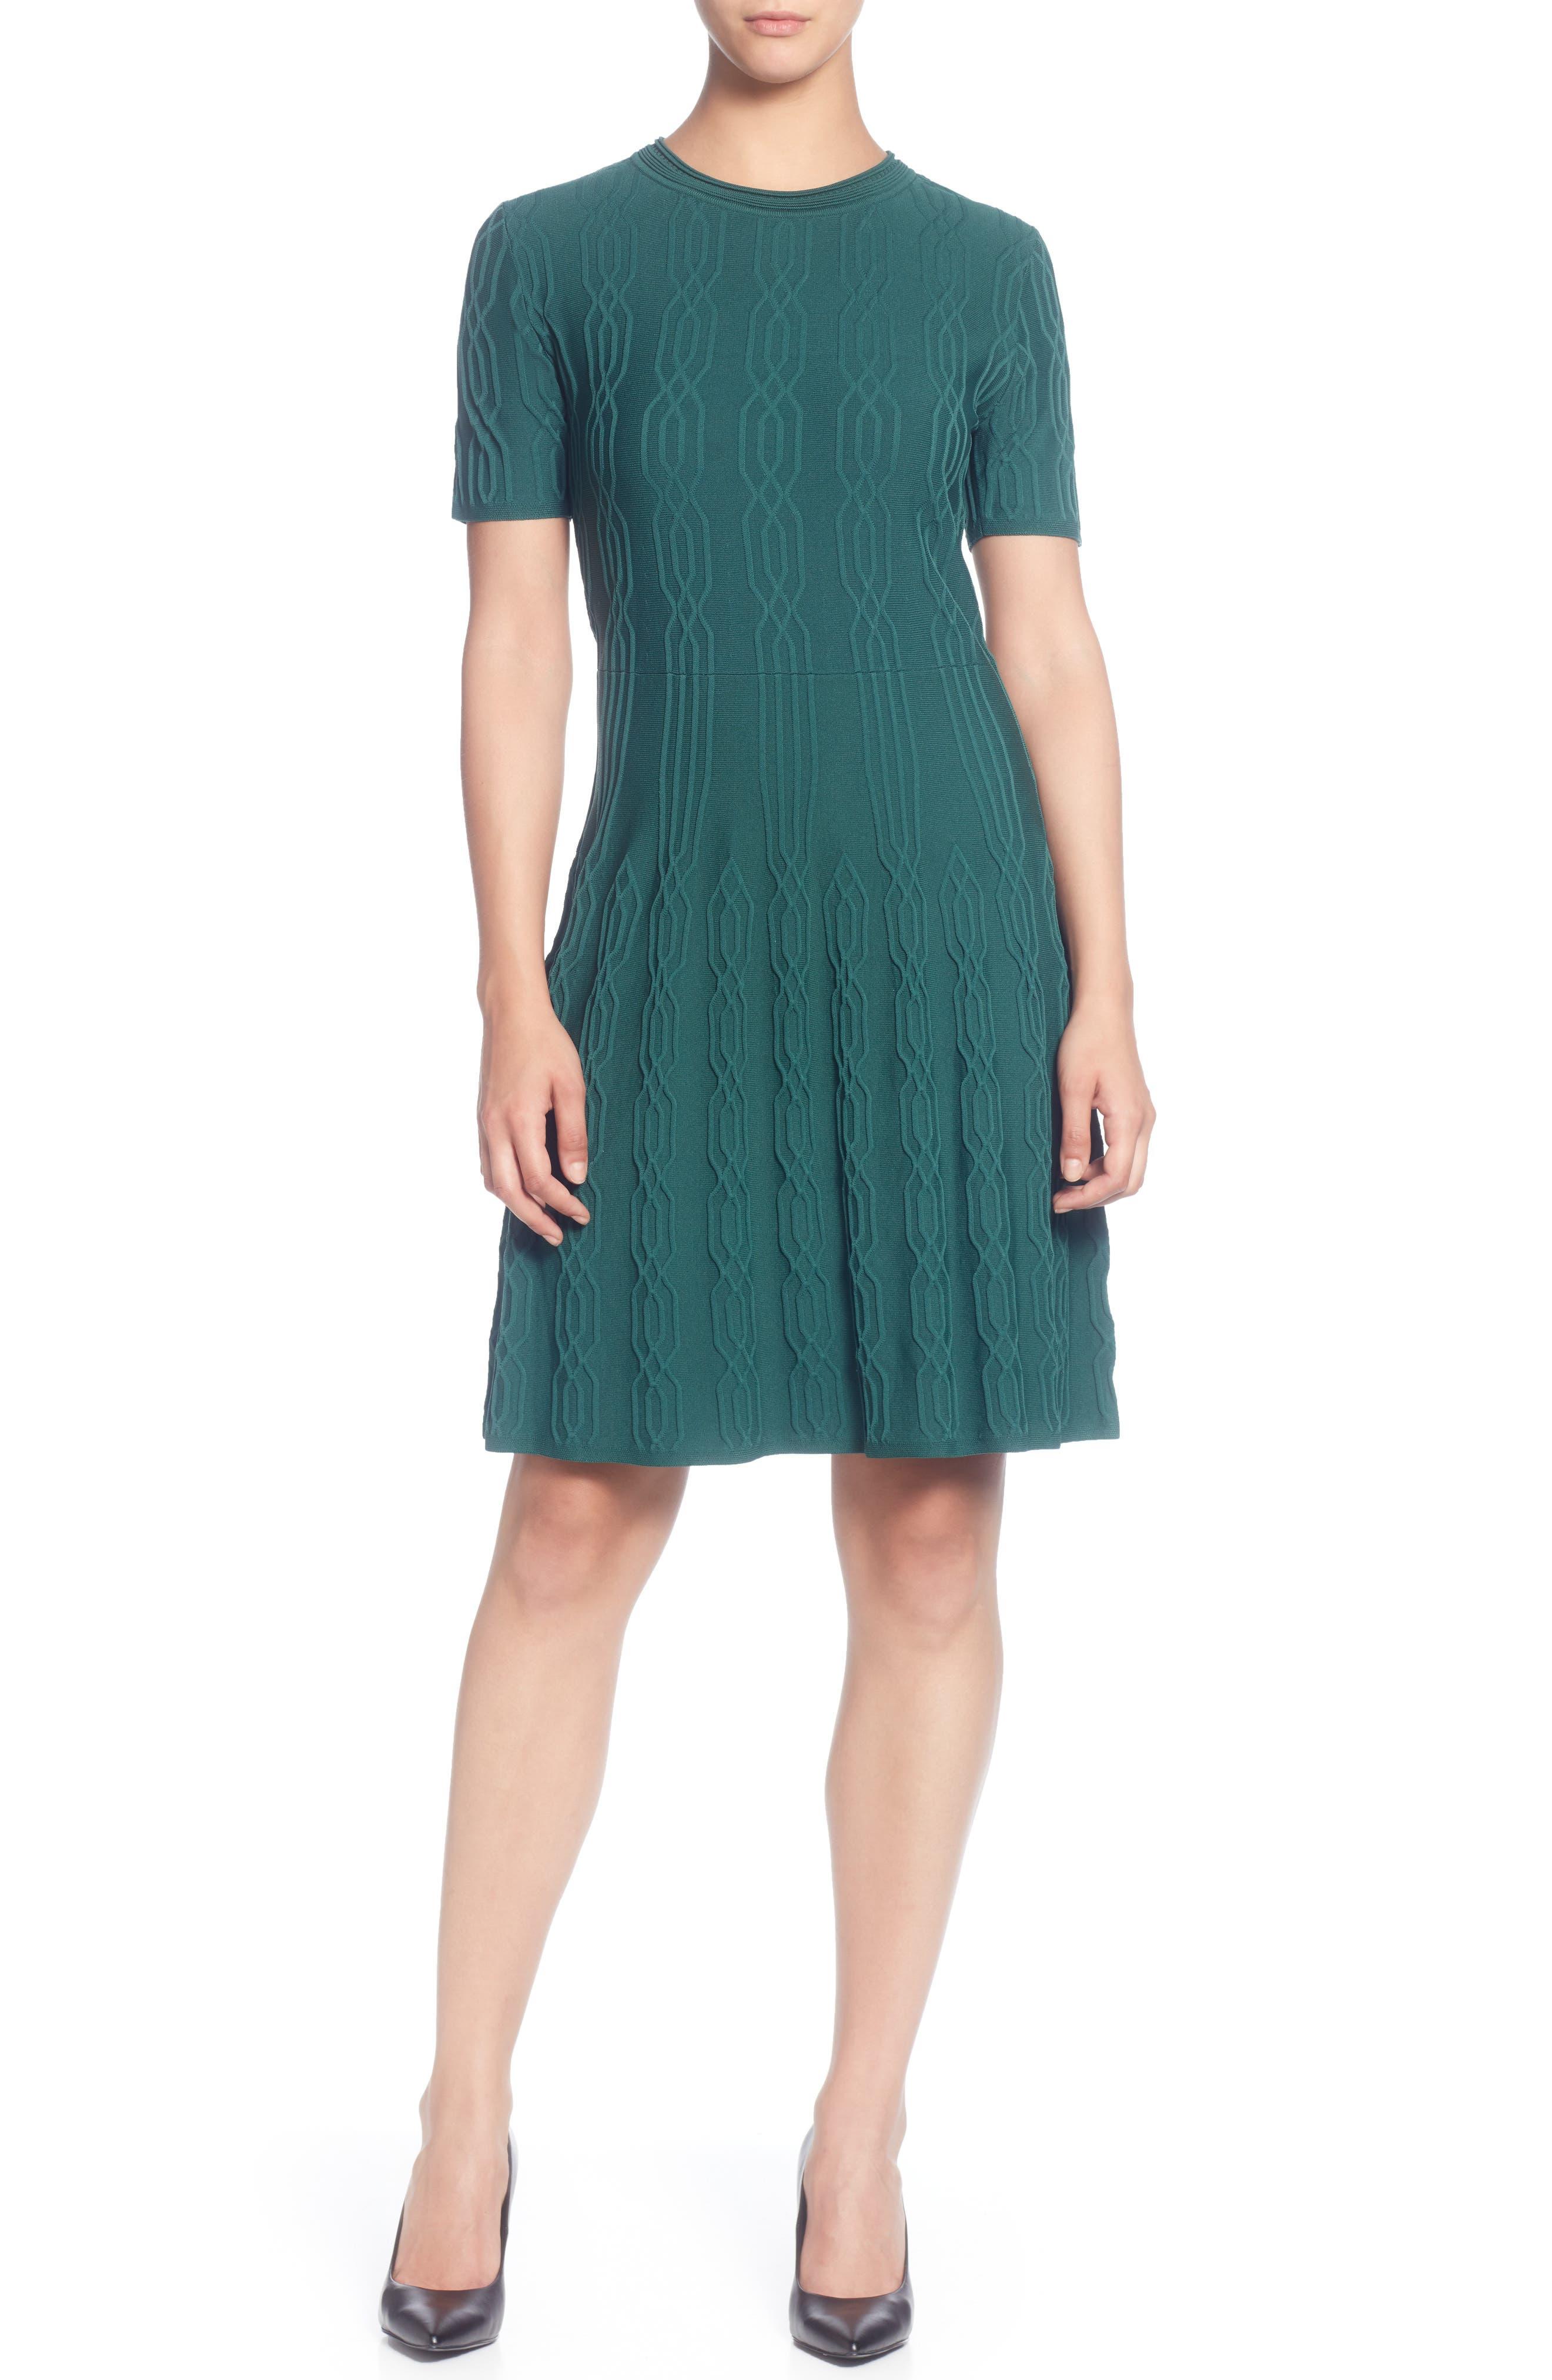 Catherine Catherine Malandrino Jacquard Sweater Dress, Green